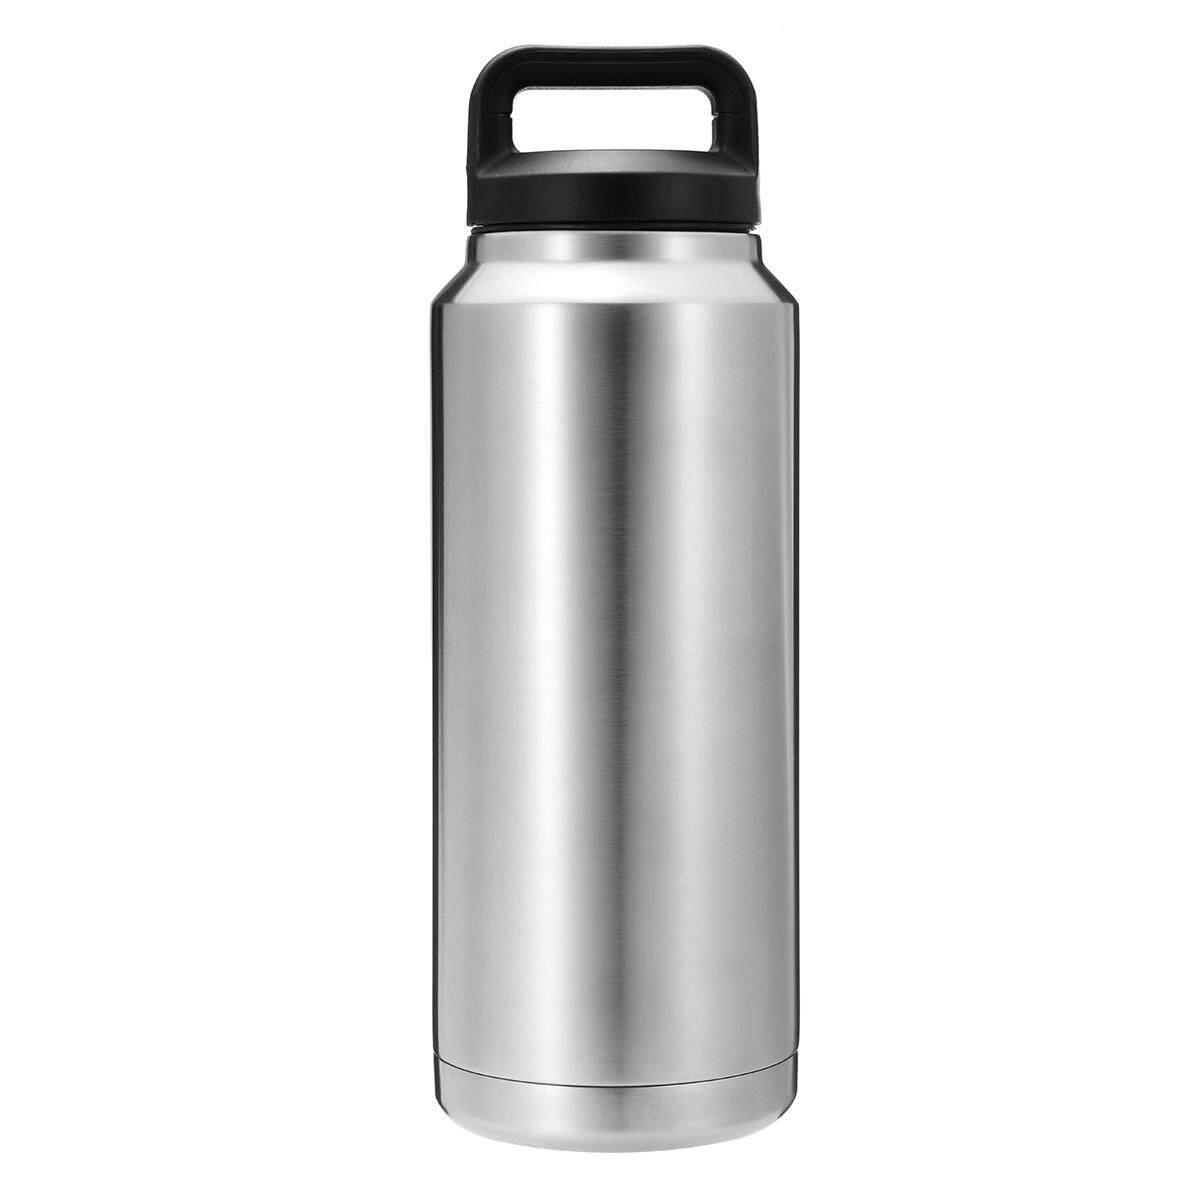 8 Oz/36 Oz/64 Oz Baja Anti Karat Sekat Vakum Botol Air Minum untuk Bepergian Cangkir Termos 36 Oz-Intl